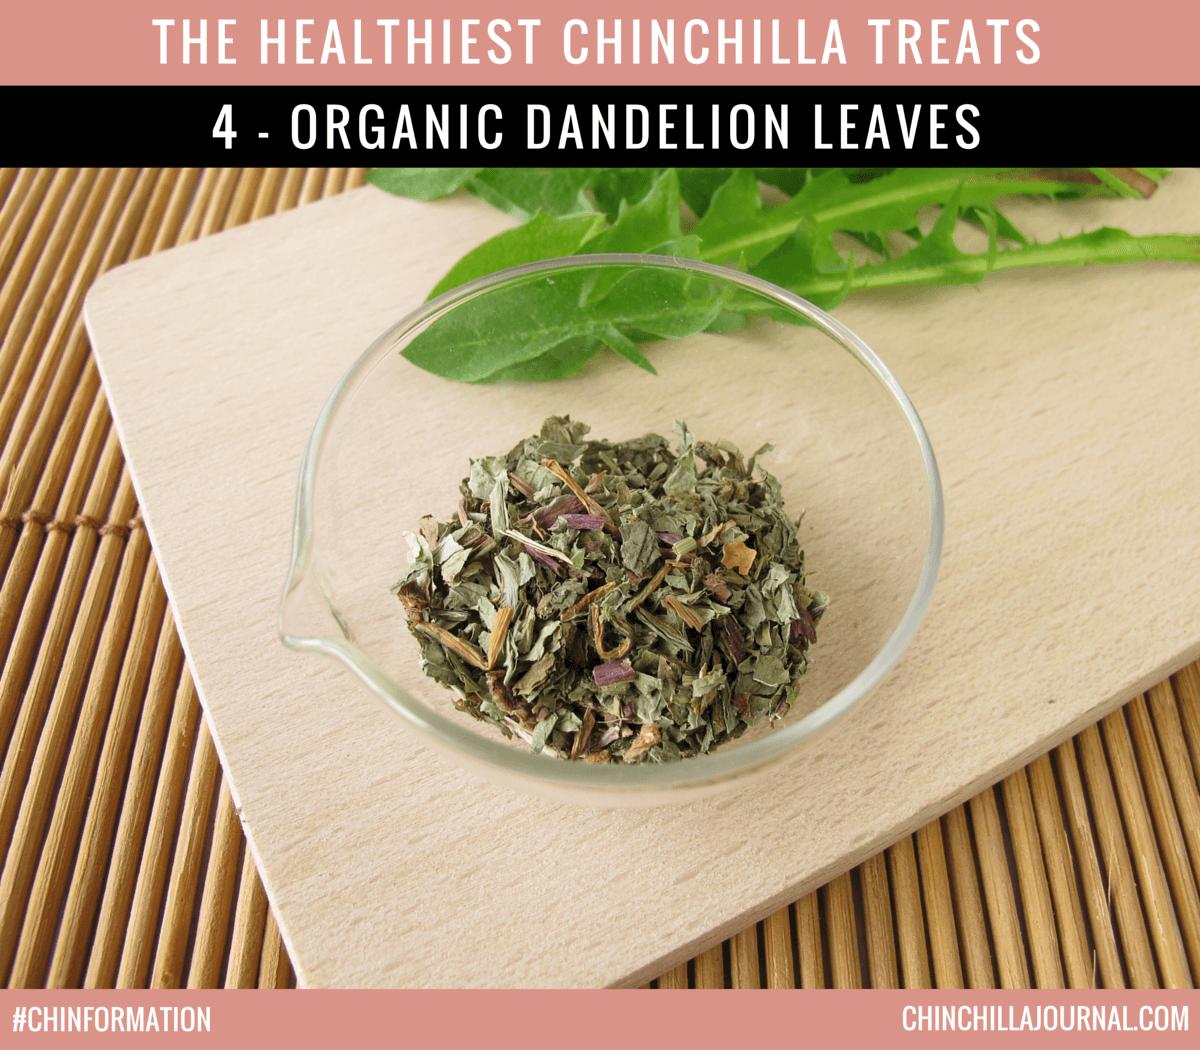 The Healthiest Chinchilla Treats - 4 - Organic Dandelion Leaves